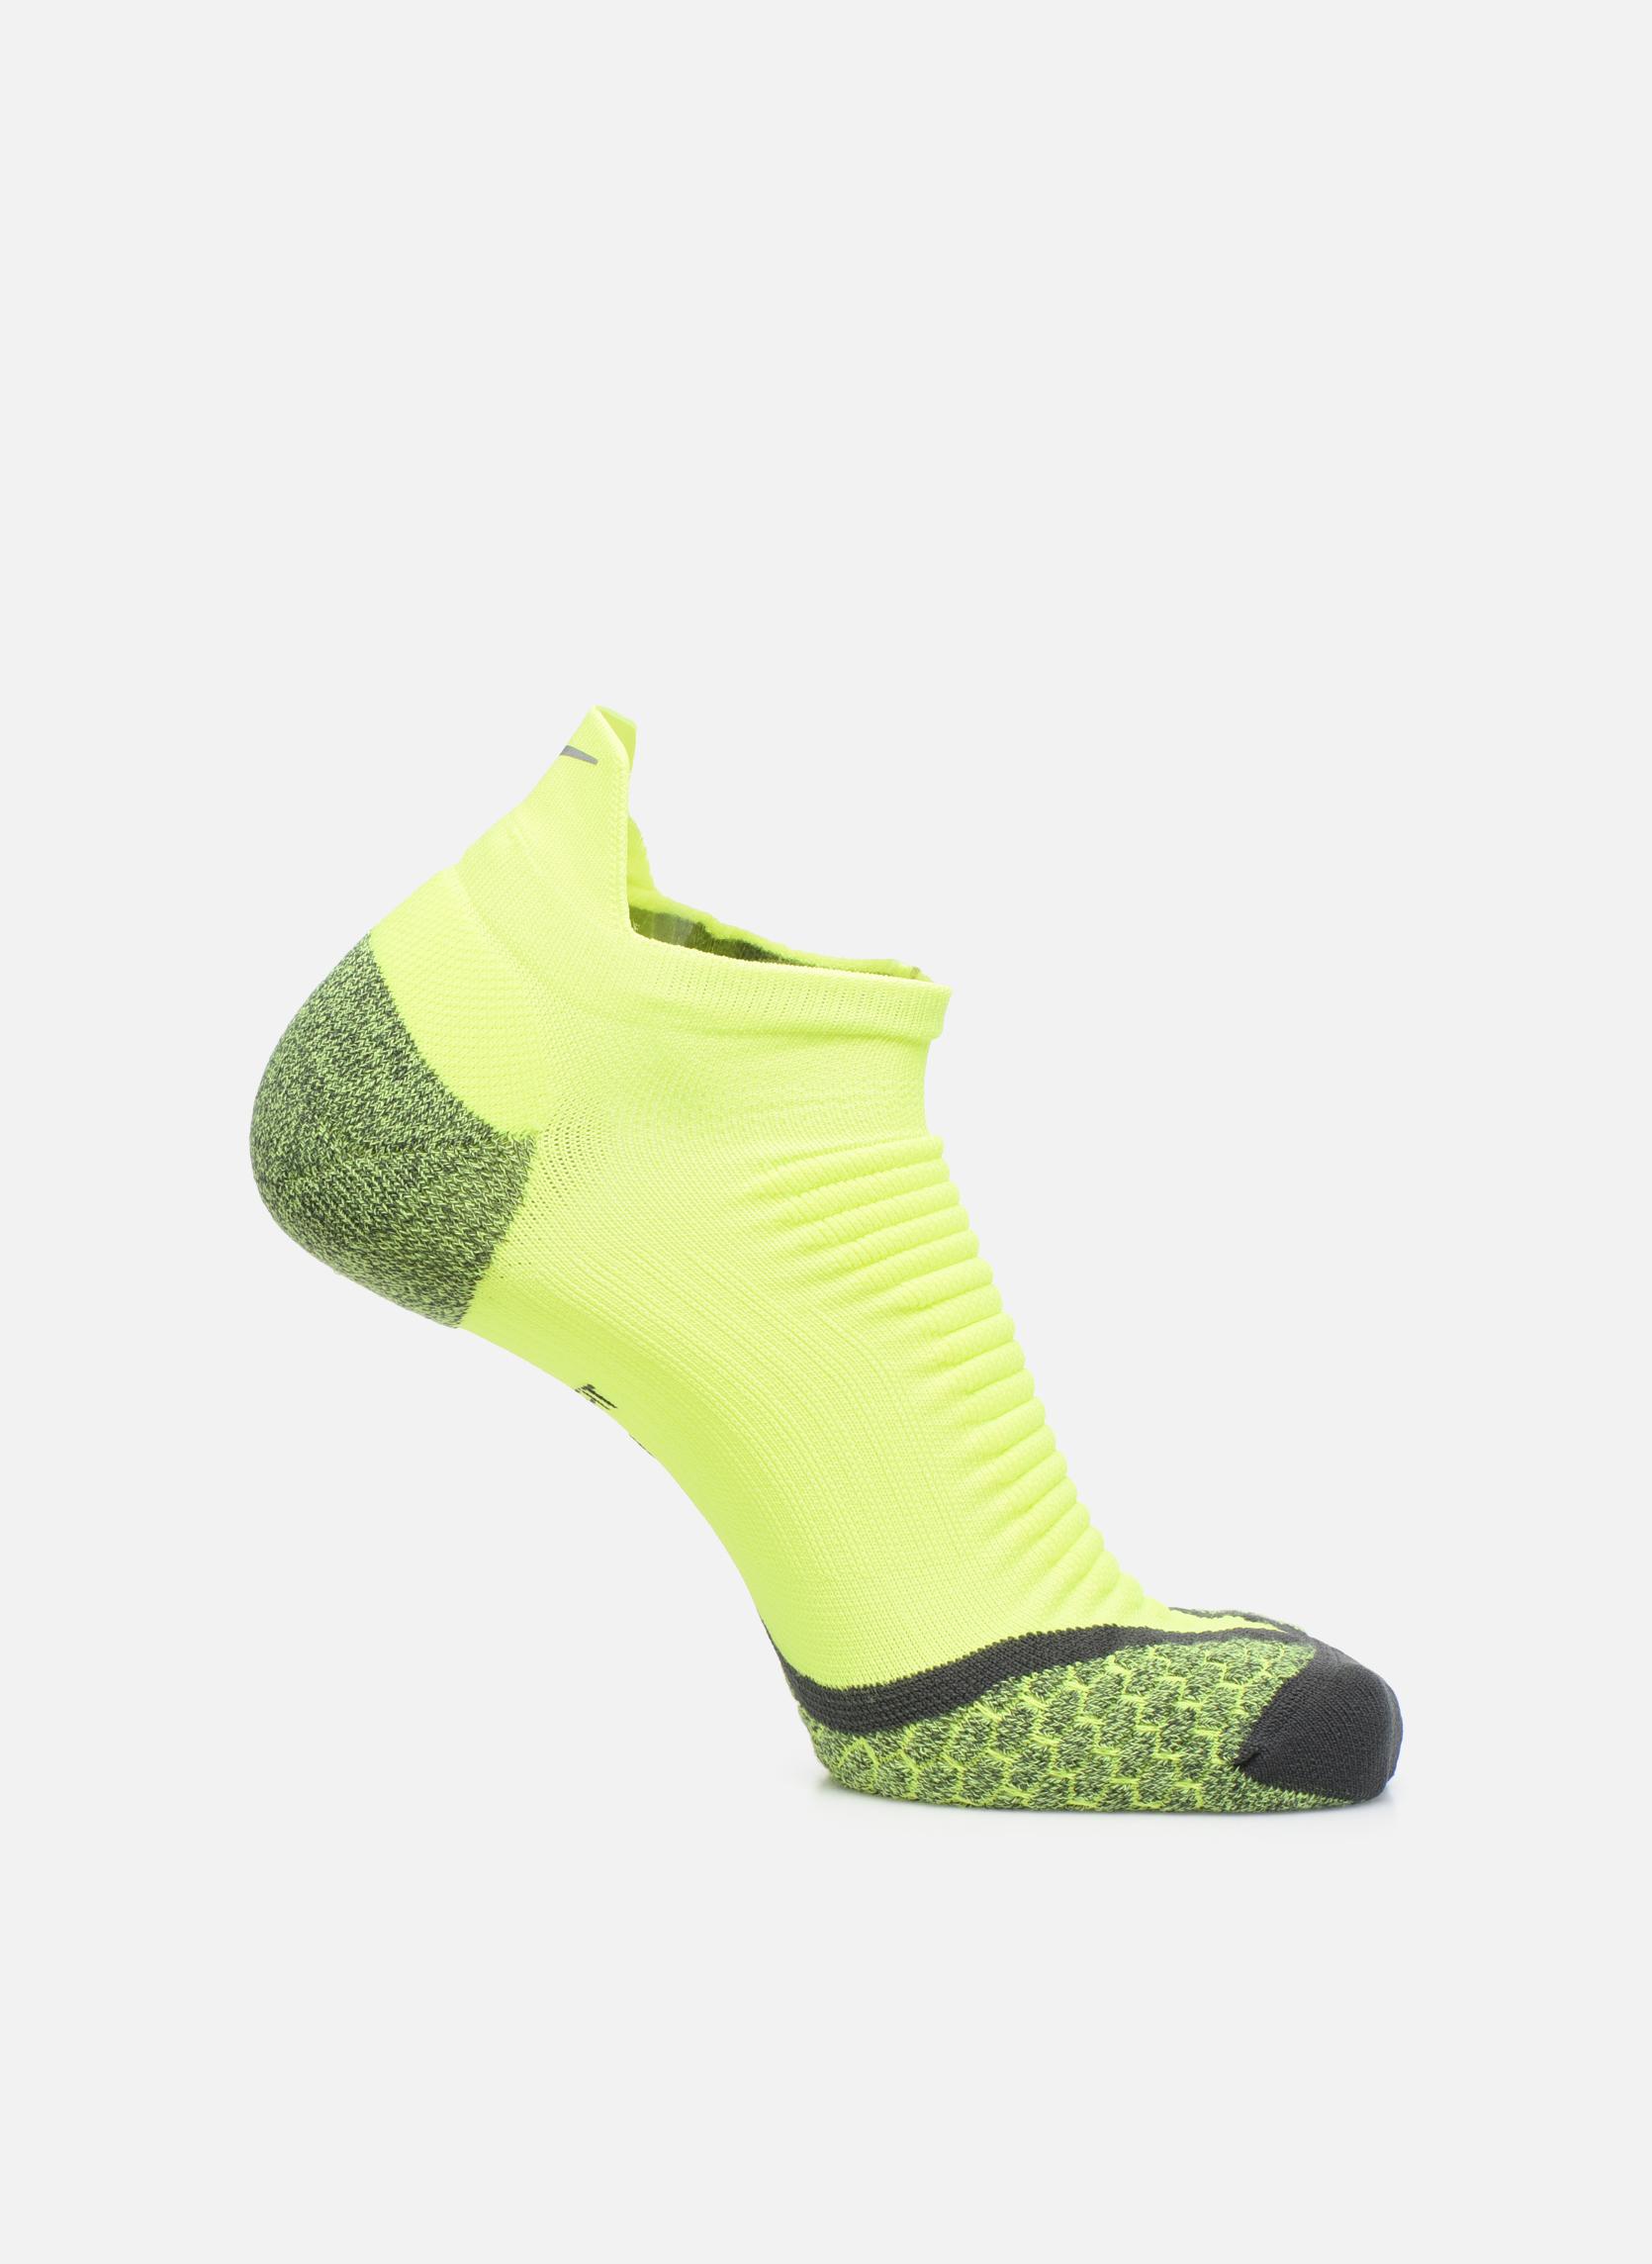 Chaussettes et collants Nike Nike Elite Cushioned No-Show Tab Running Sock Jaune vue détail/paire